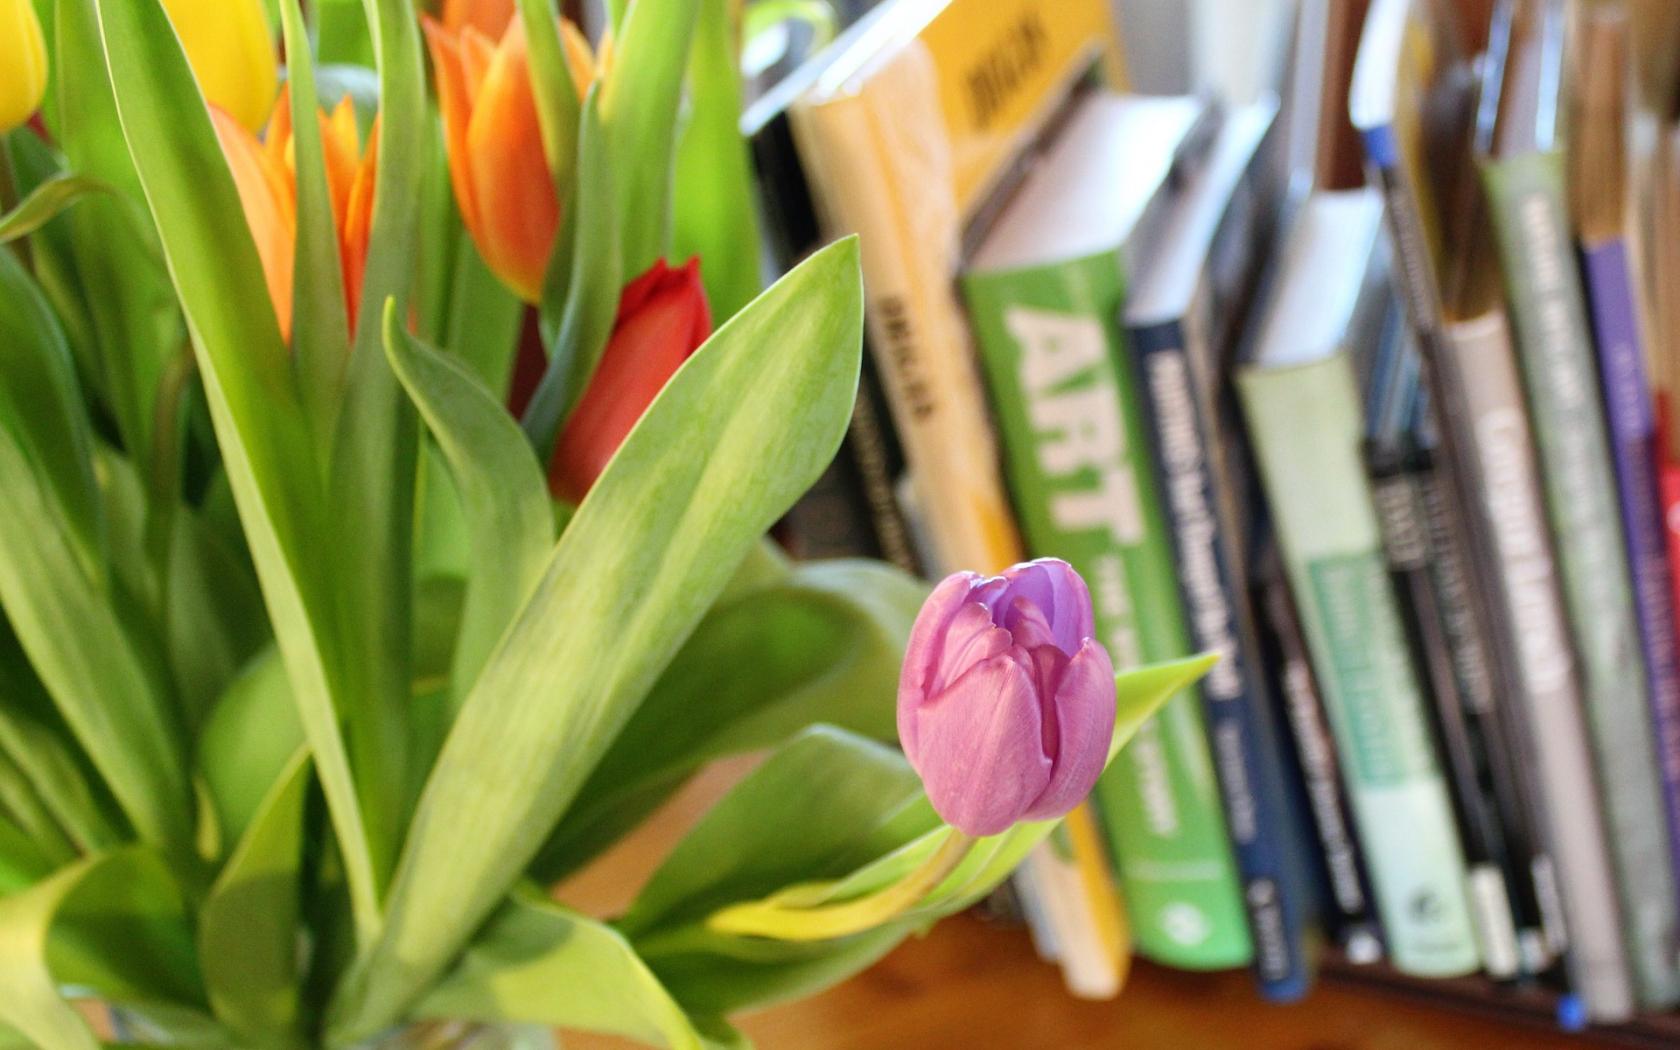 Download 1680x1050 Wallpaper Pink Tulip Bud Books Widescreen 16 10